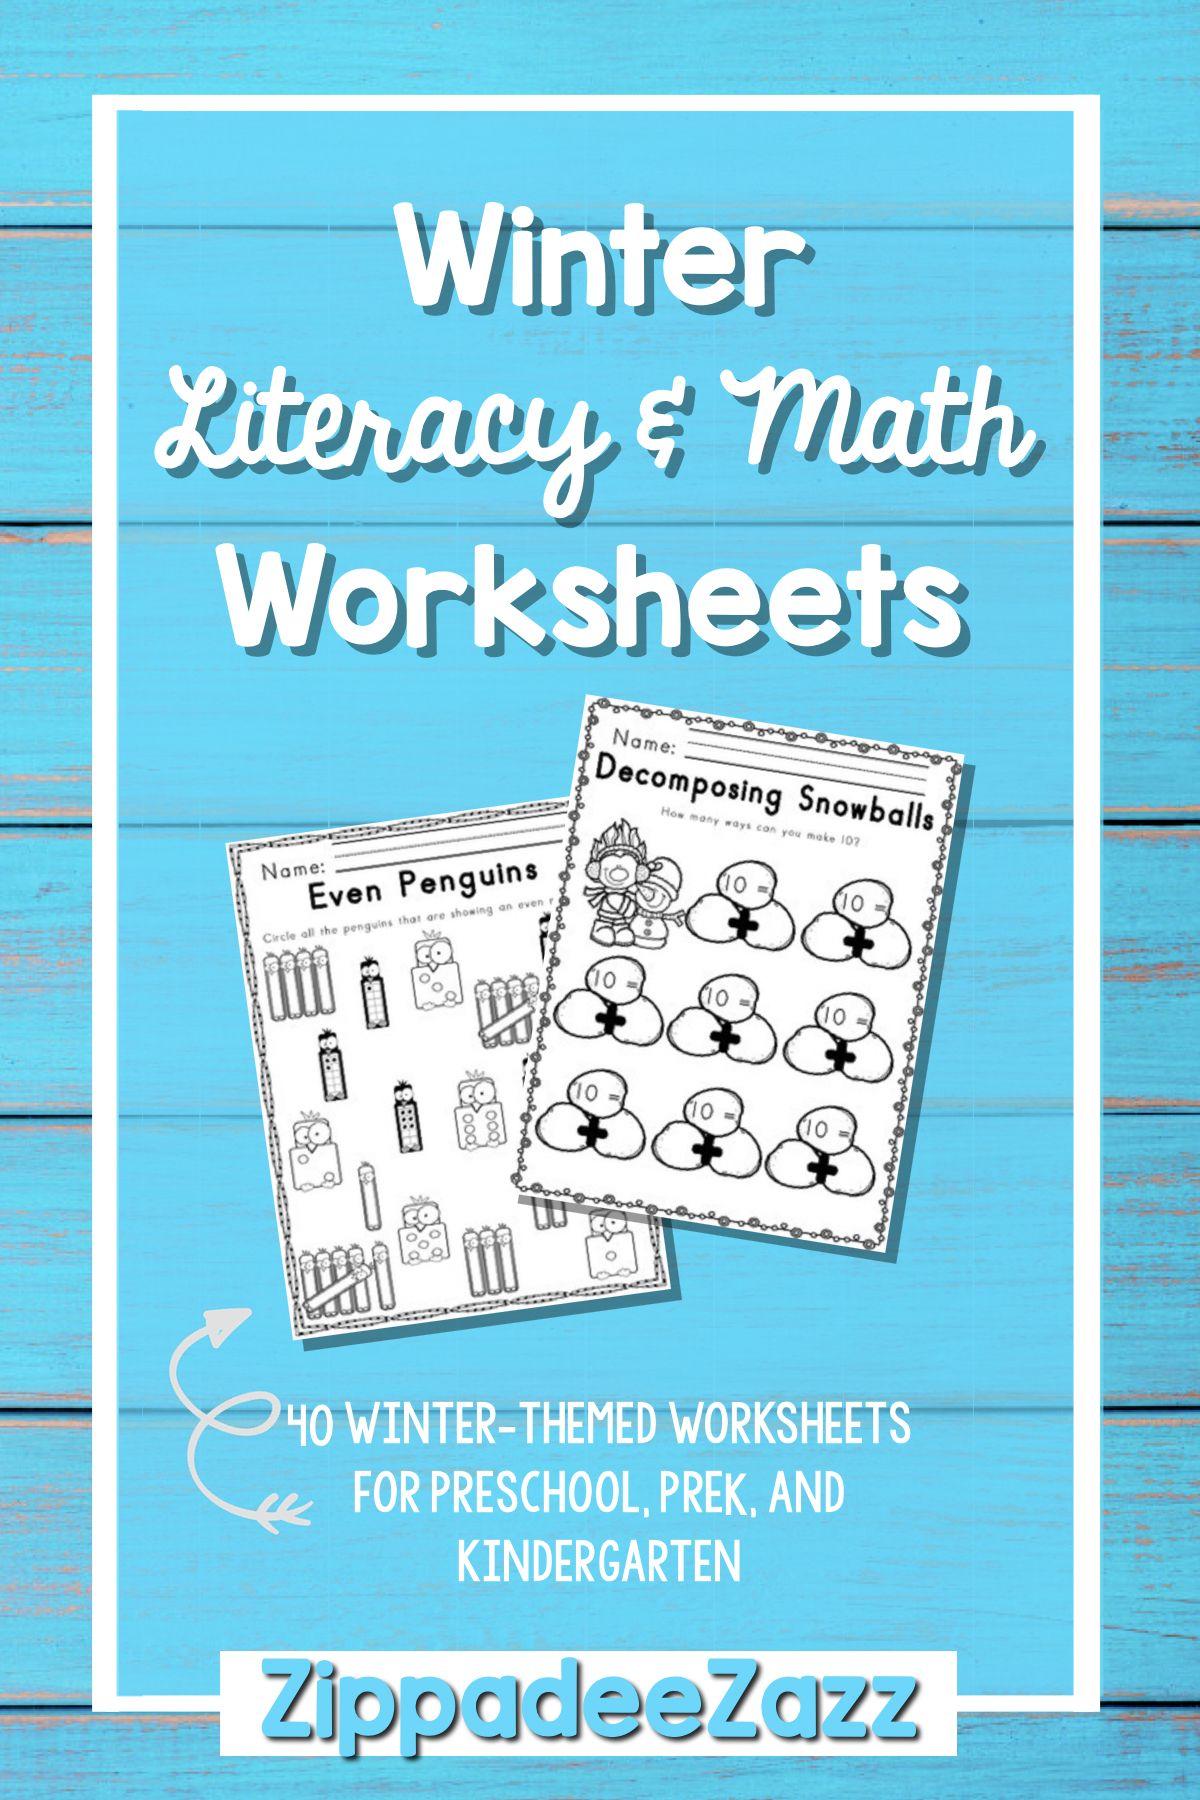 Worksheets for Winter ELA Literacy and Math Activities | Seasonal ...